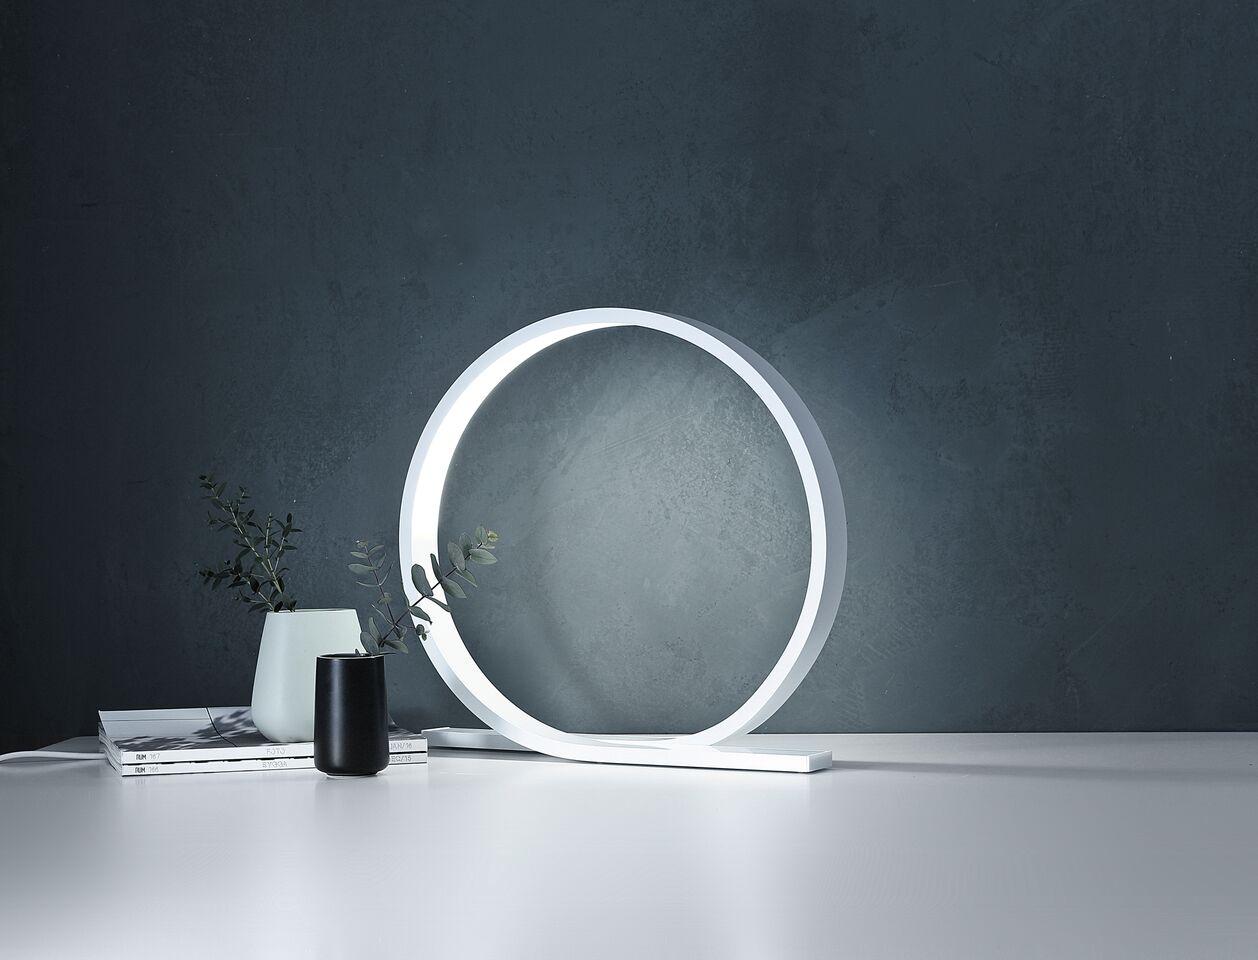 The LOOP Table Lamp by HIMMEE